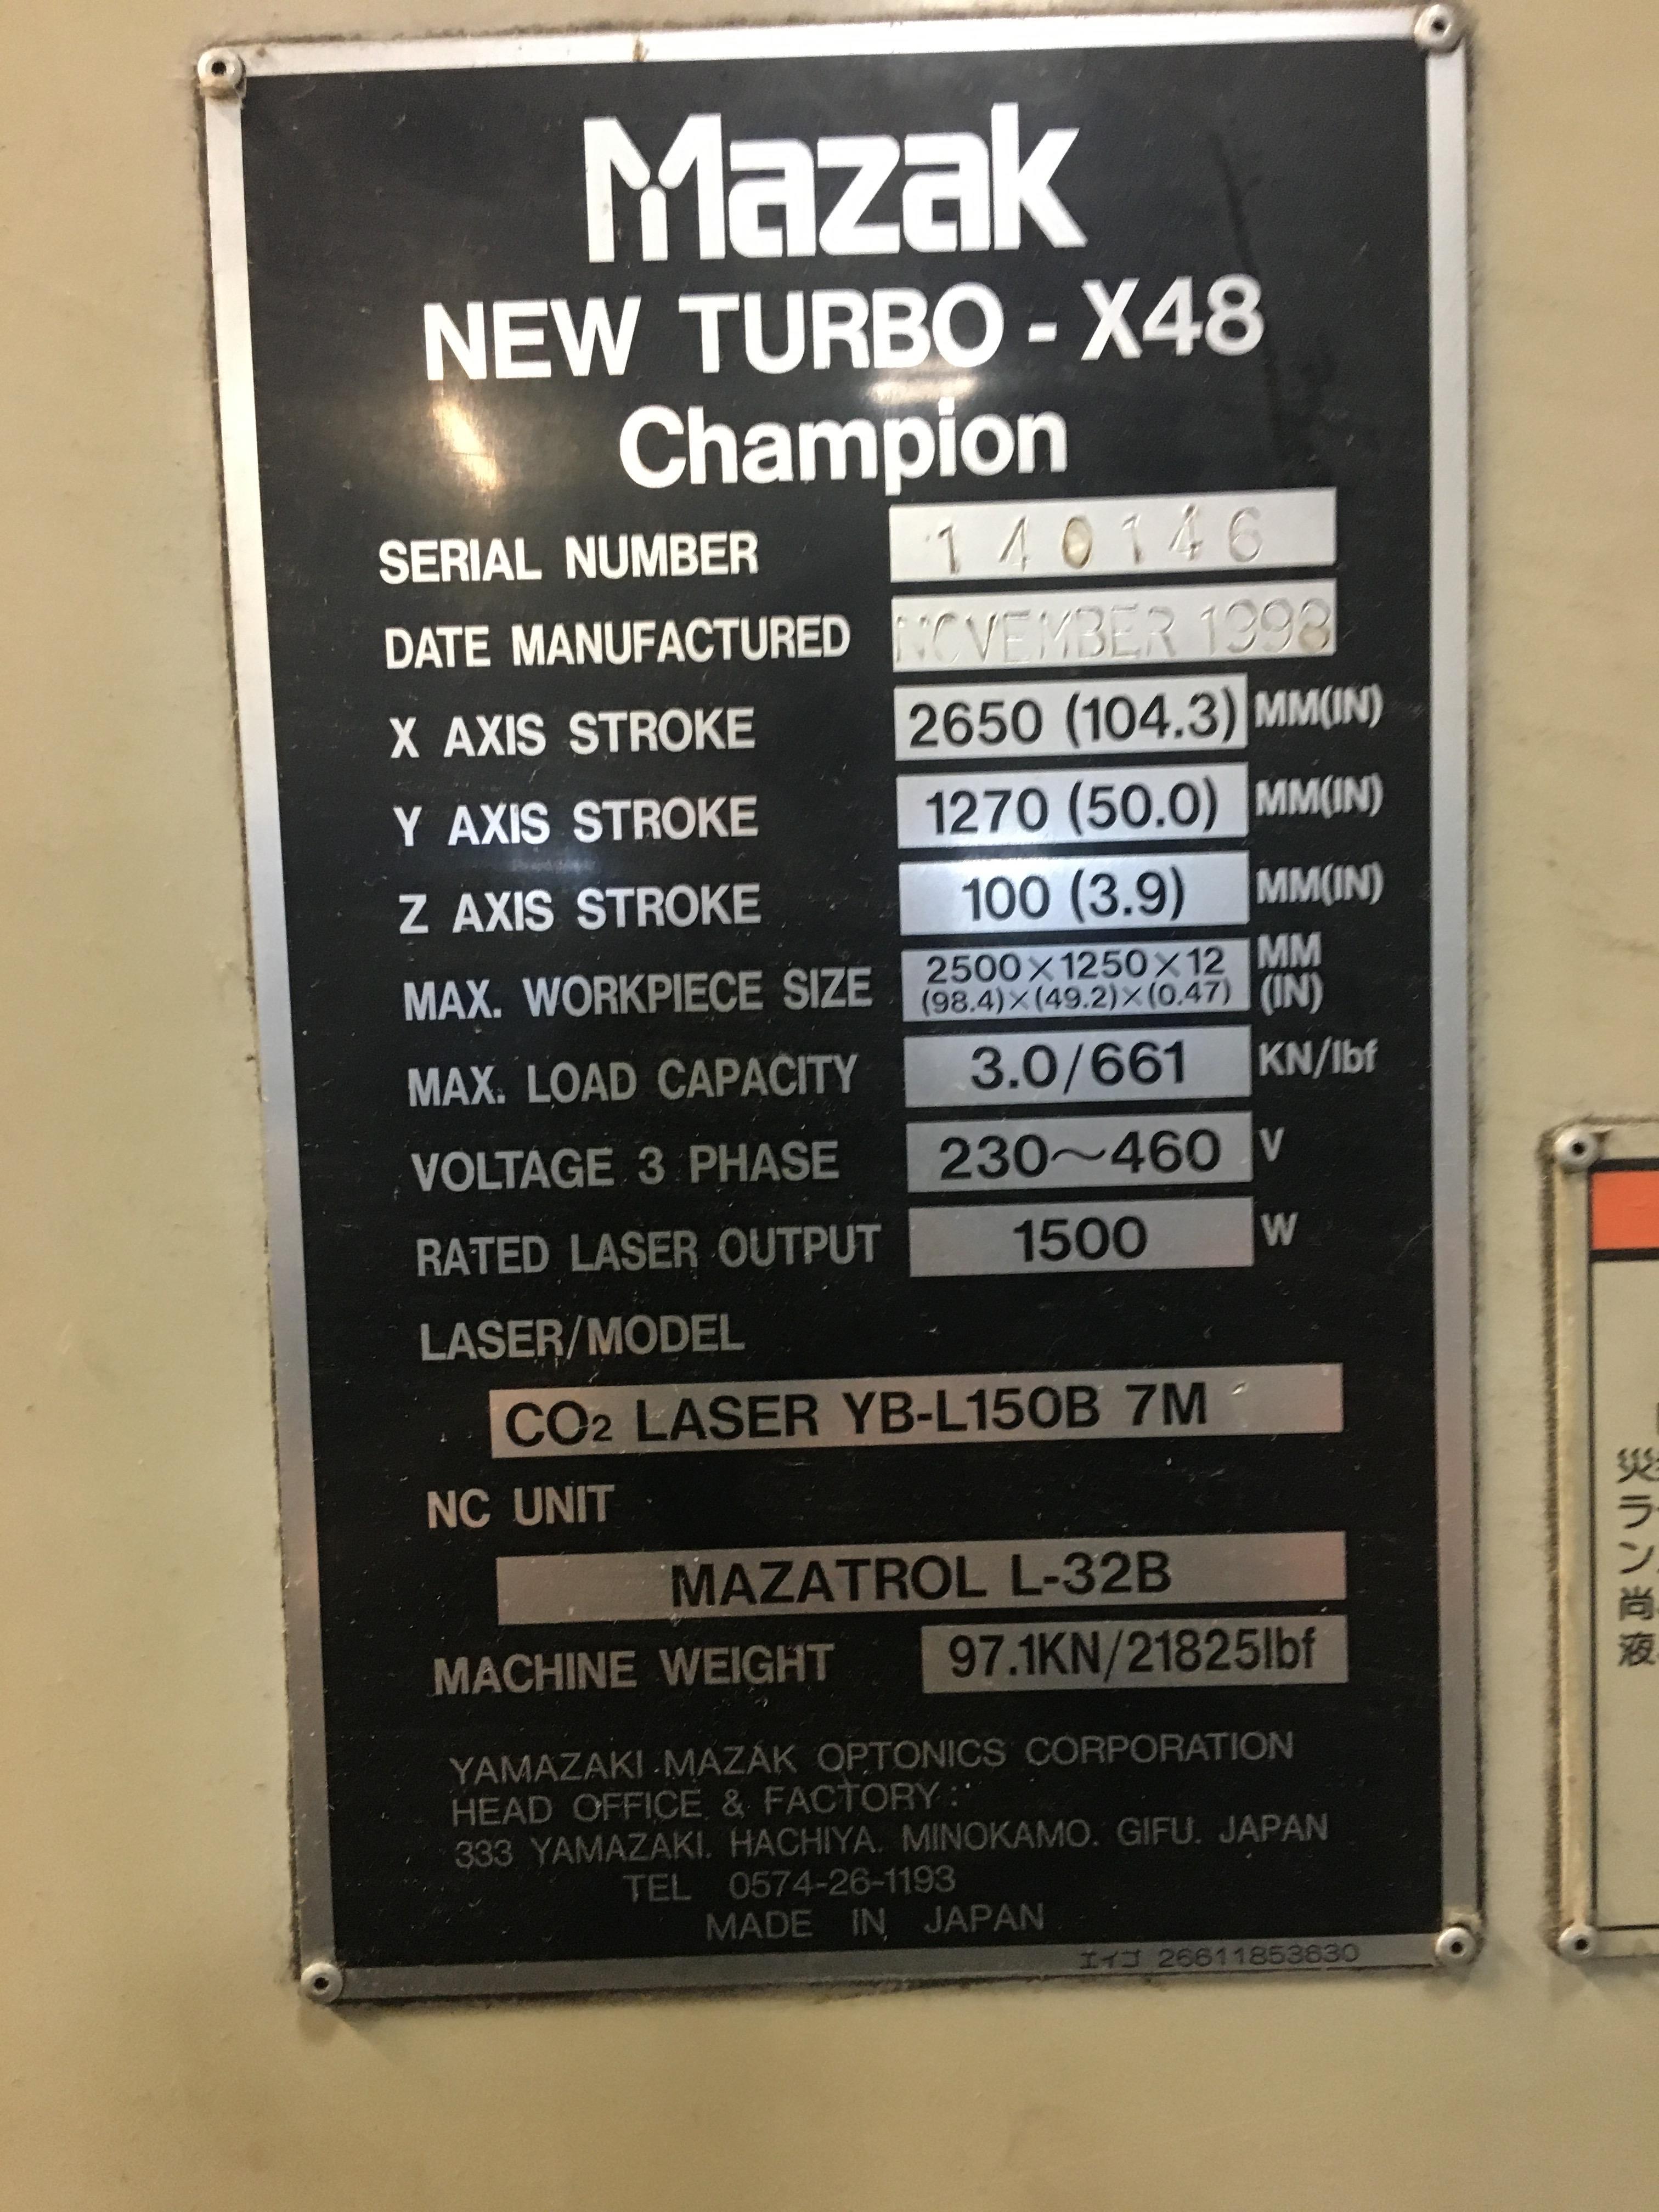 "Mazak Model X-48 Champion Co2 Laser, 1500 Watt, 49"" x 98"" Capacity, Orion Chiller, 55,000 Hours - Image 9 of 10"